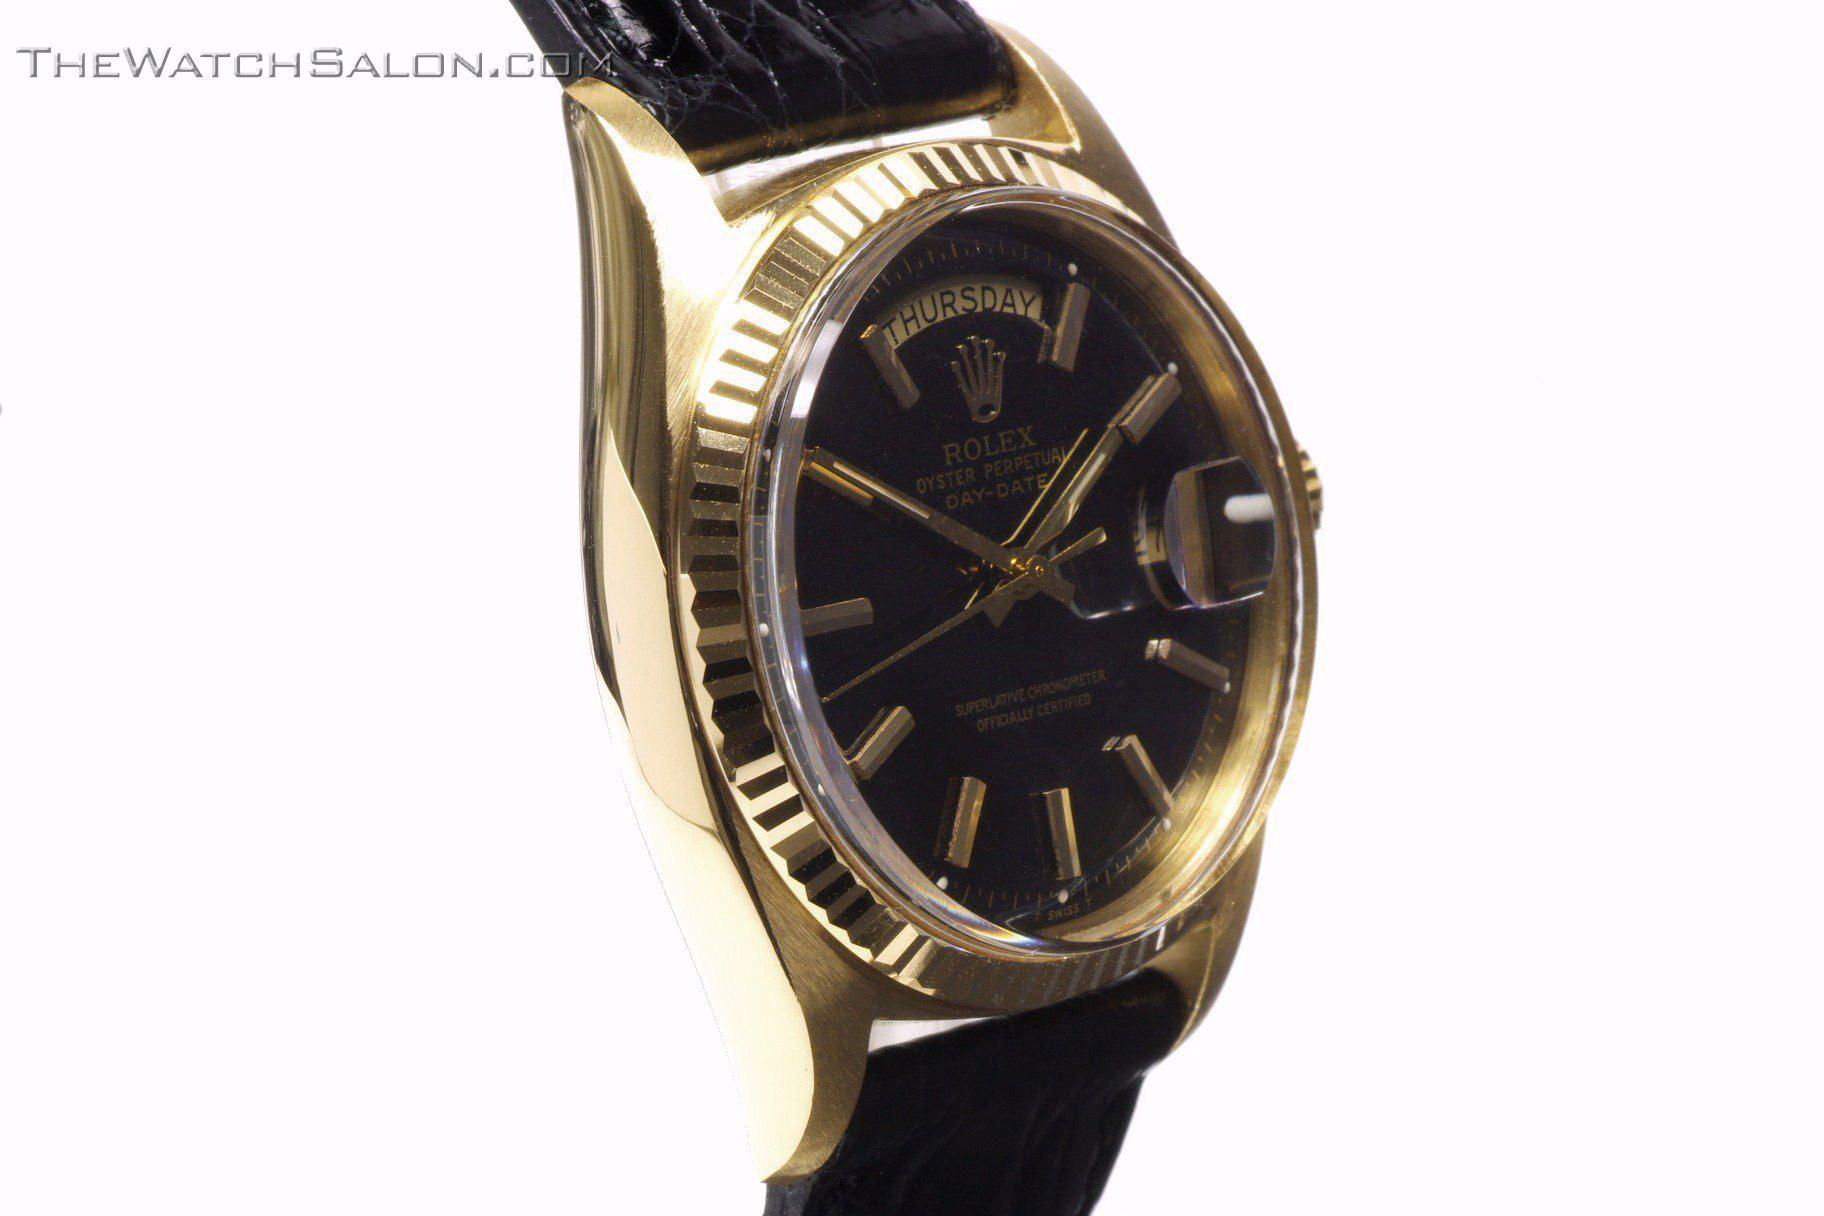 Rolex 18k gold president day date watch 1969 r56 non crown